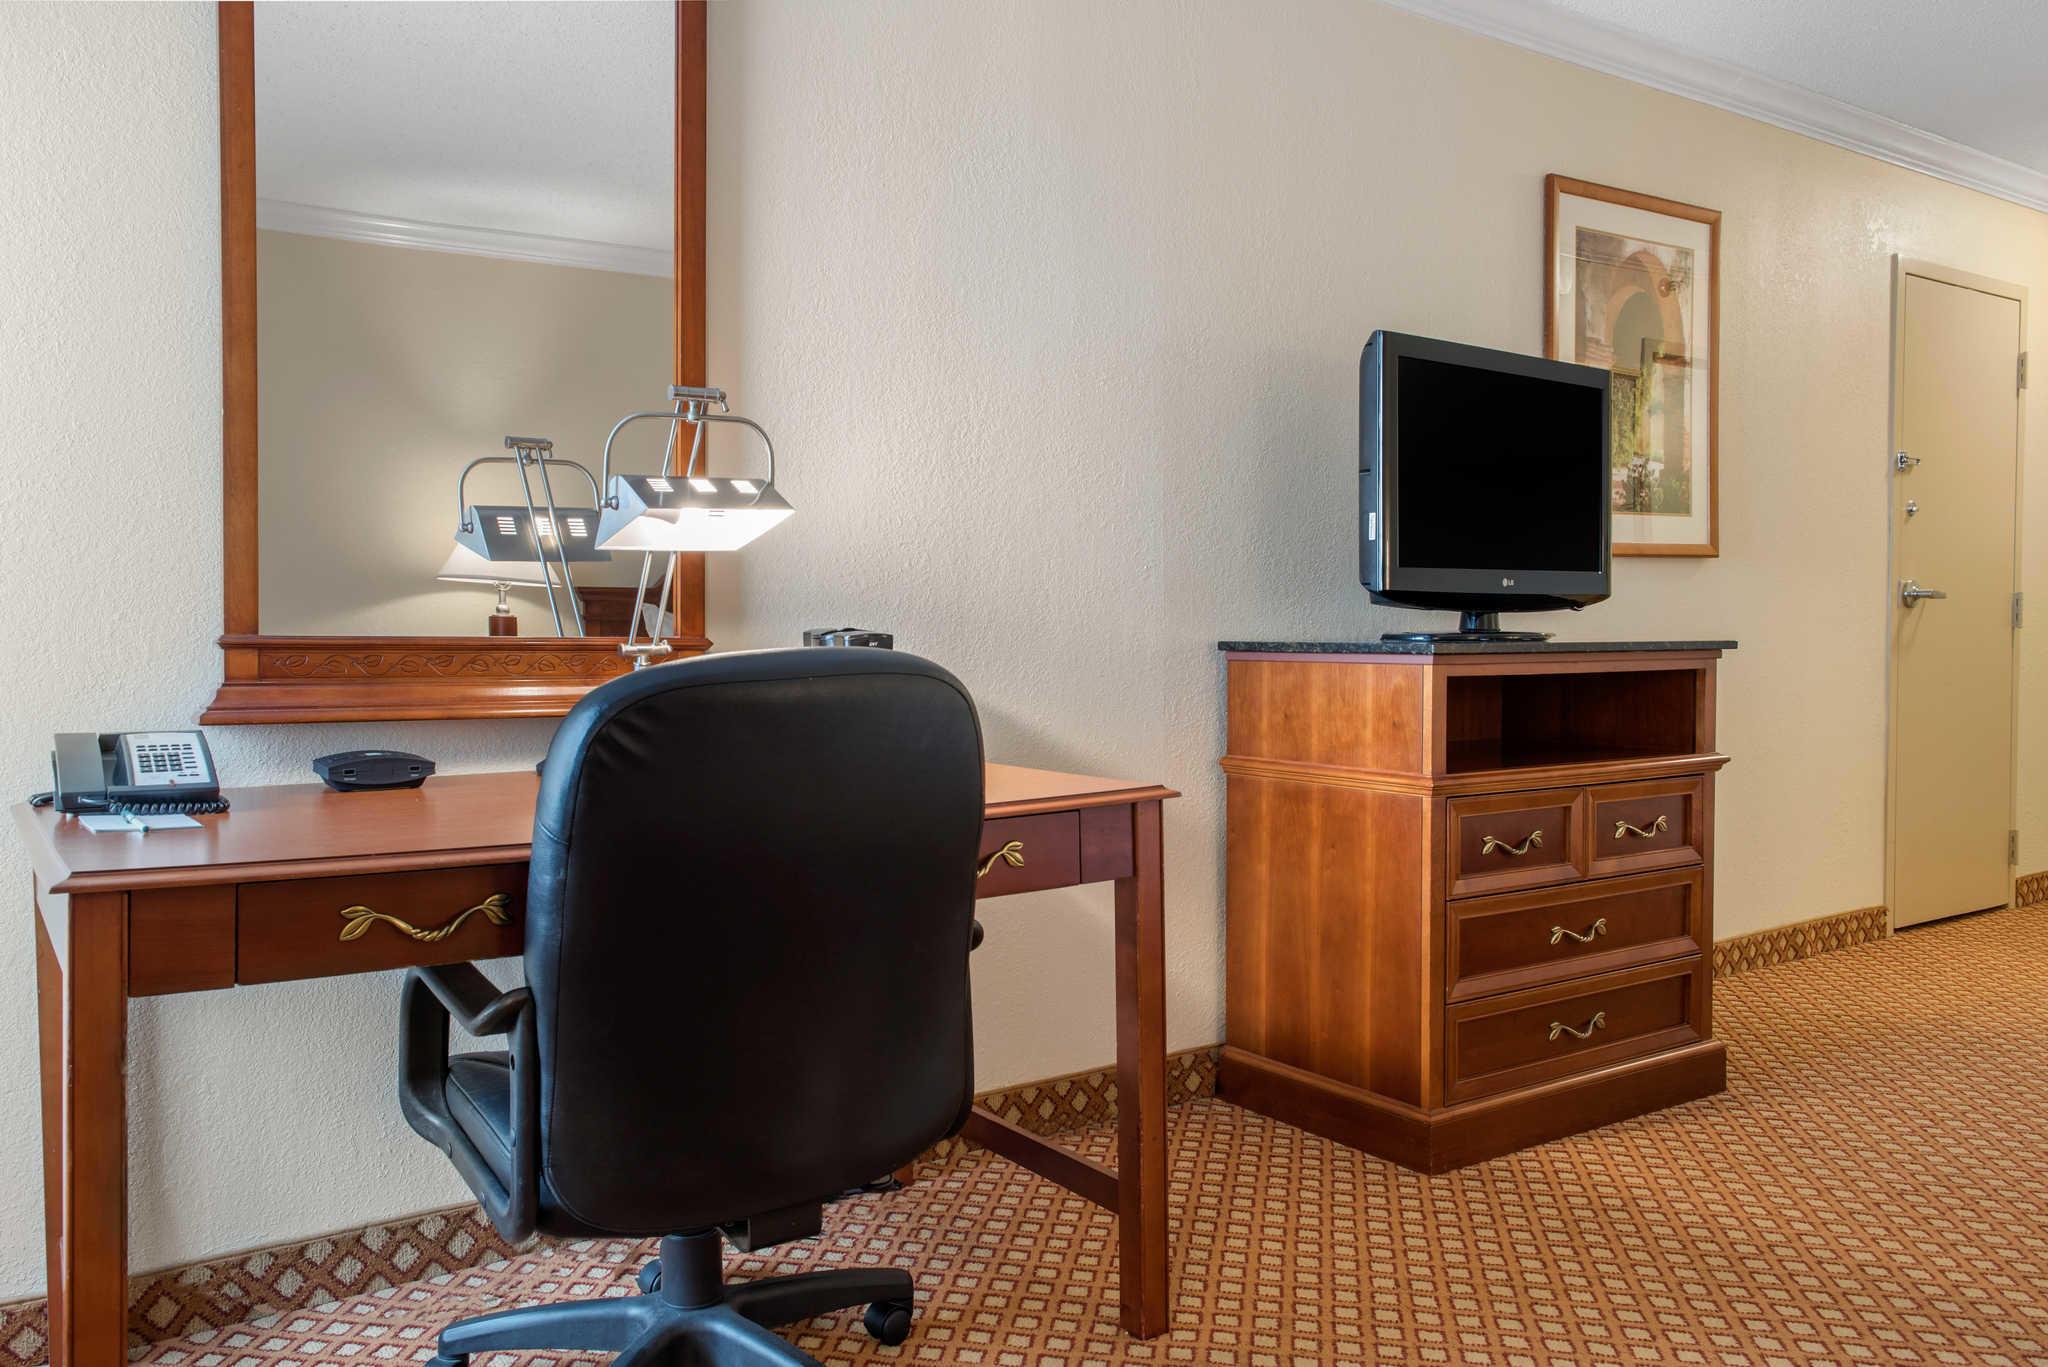 Quality Hotel - Cincinnati Blue Ash image 14